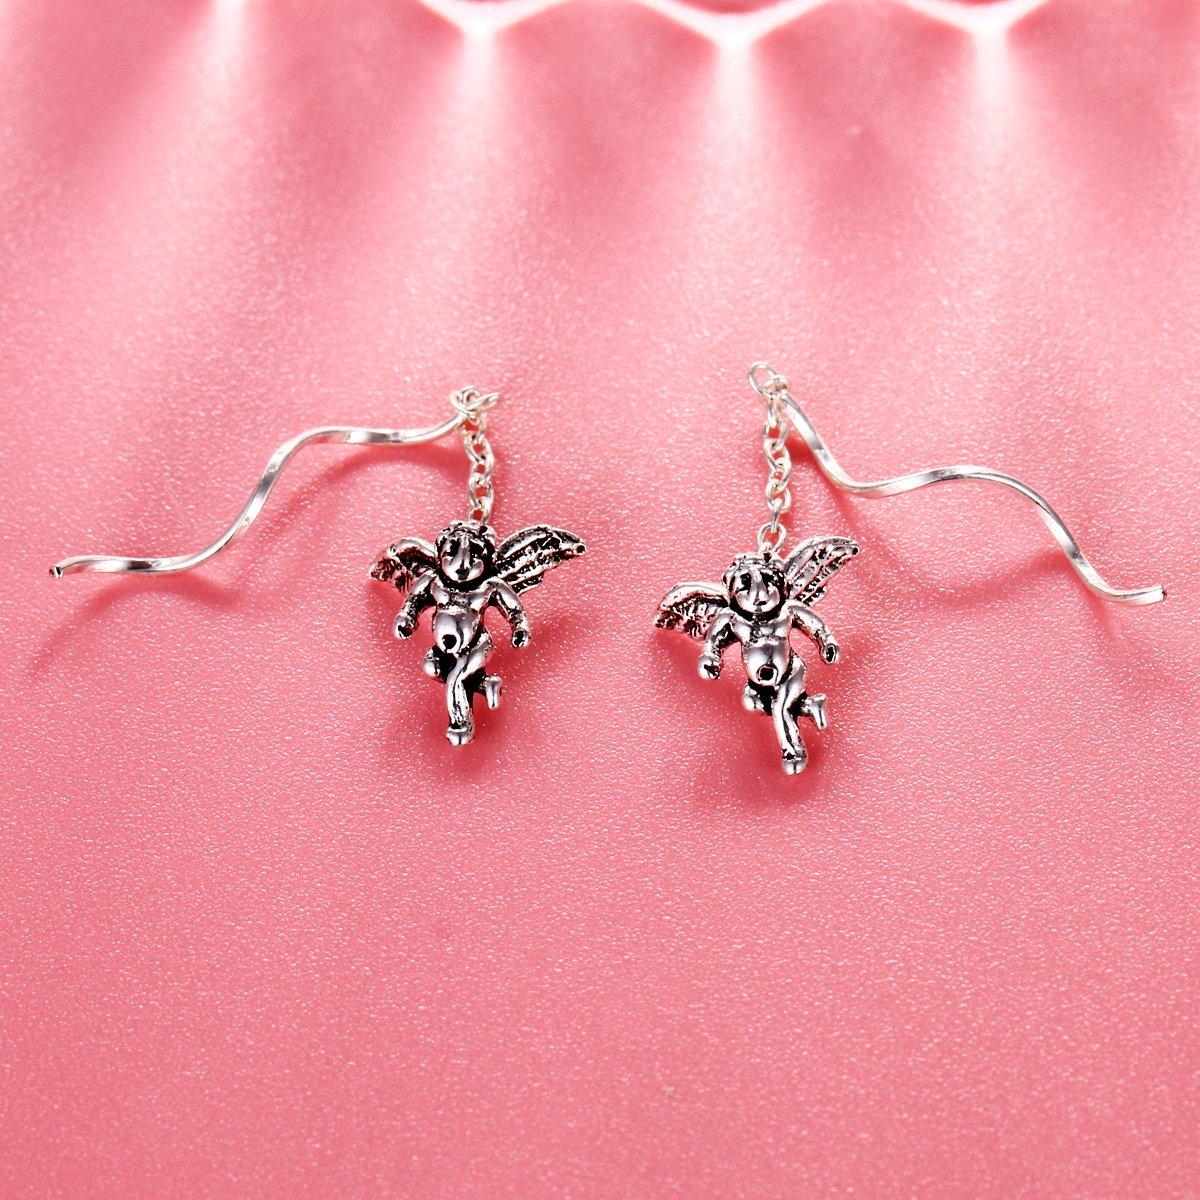 EVER FAITH 925 Sterling Silver Retro Cute Love Angel Cupid Twist Ear Threader Dangle Earrings